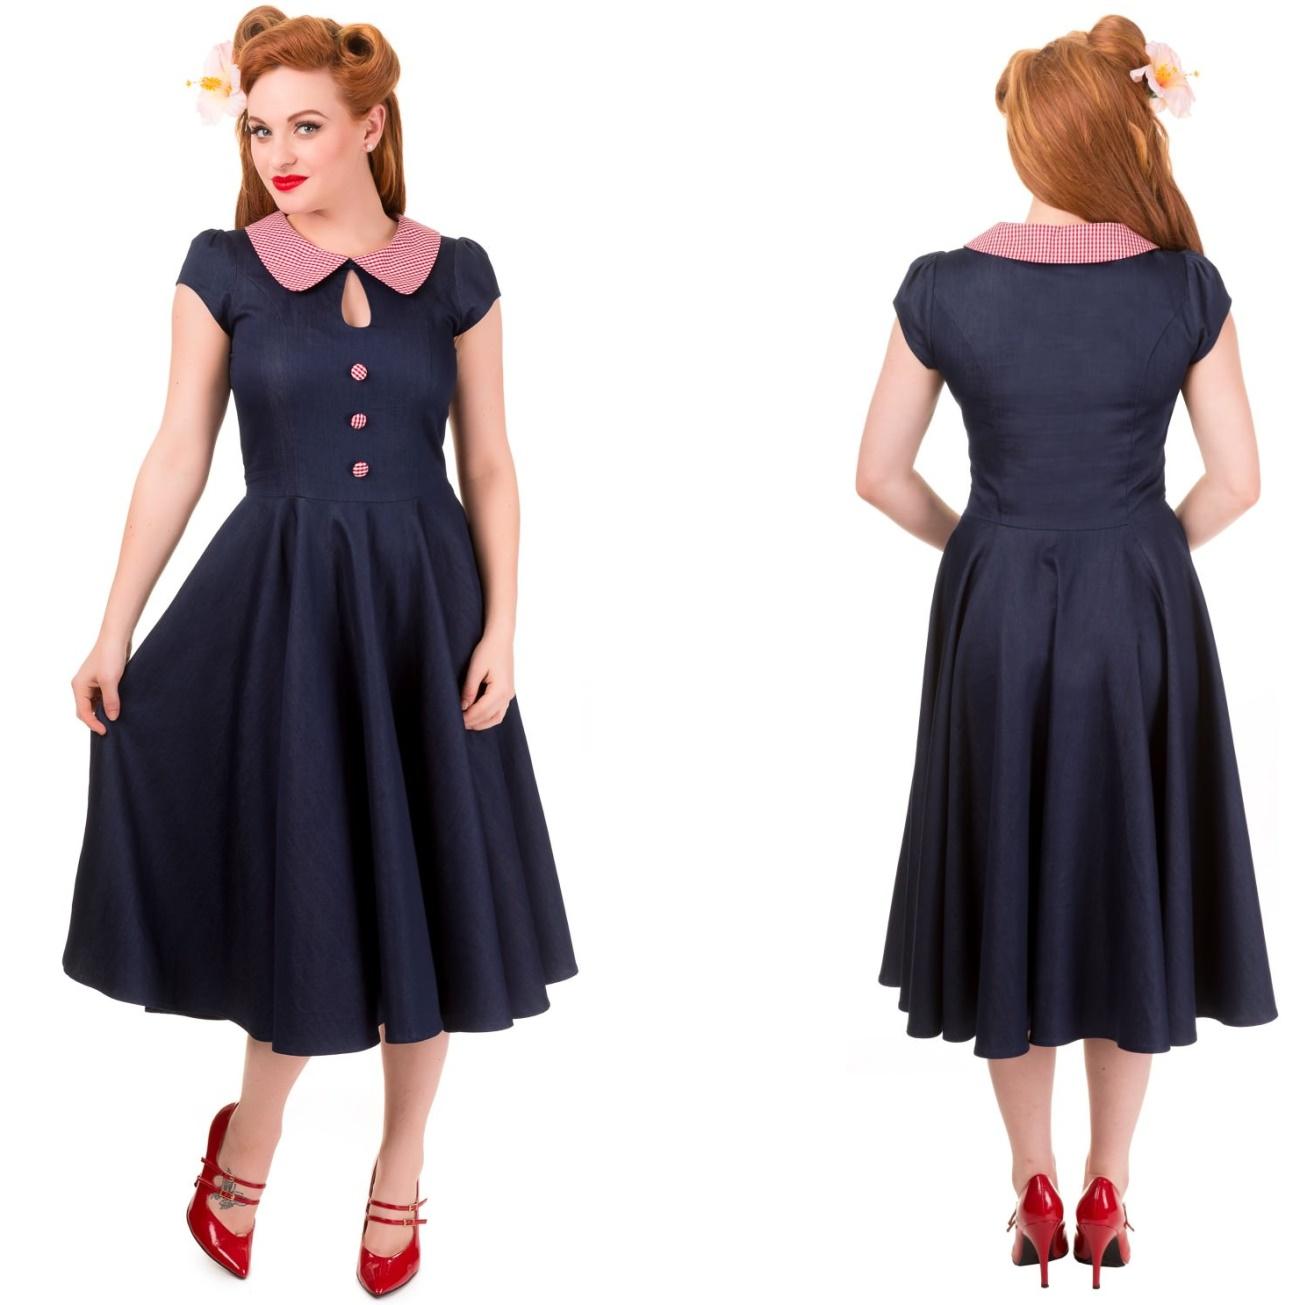 Blueberry Hill Dress Rock n Roll Kleid Banned - Banned Kleider ...